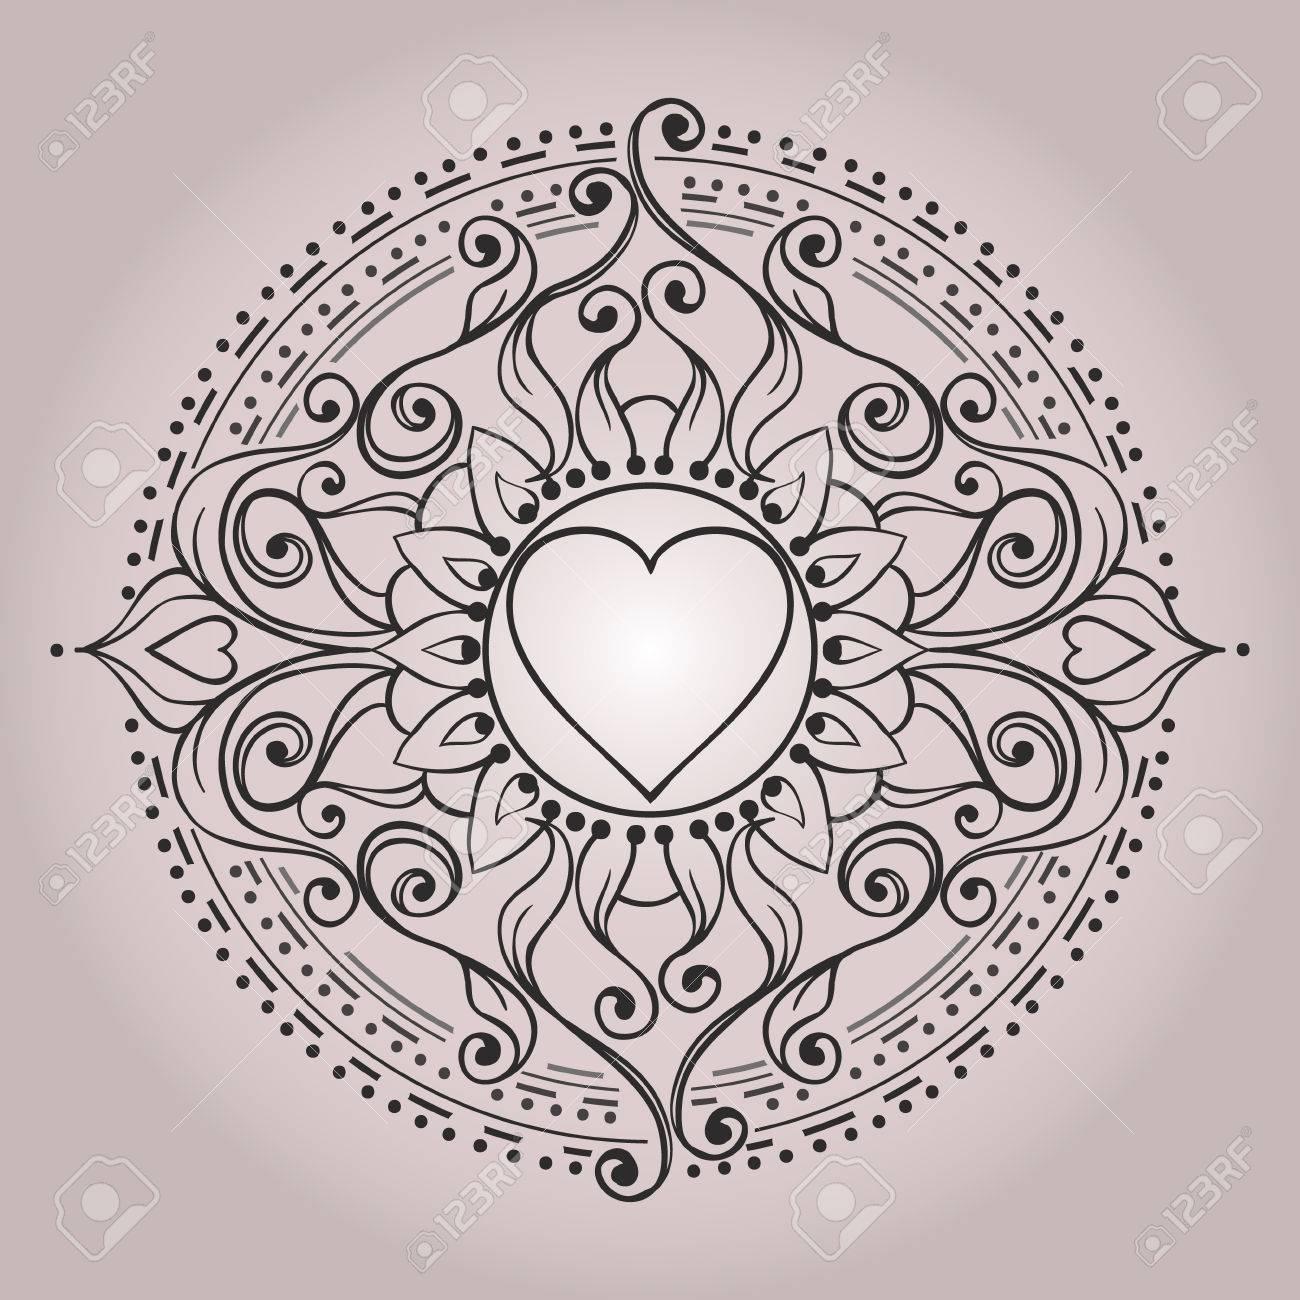 Sketch Of Henna Heart Tattoo Mehndi Elements For Tattoo Design